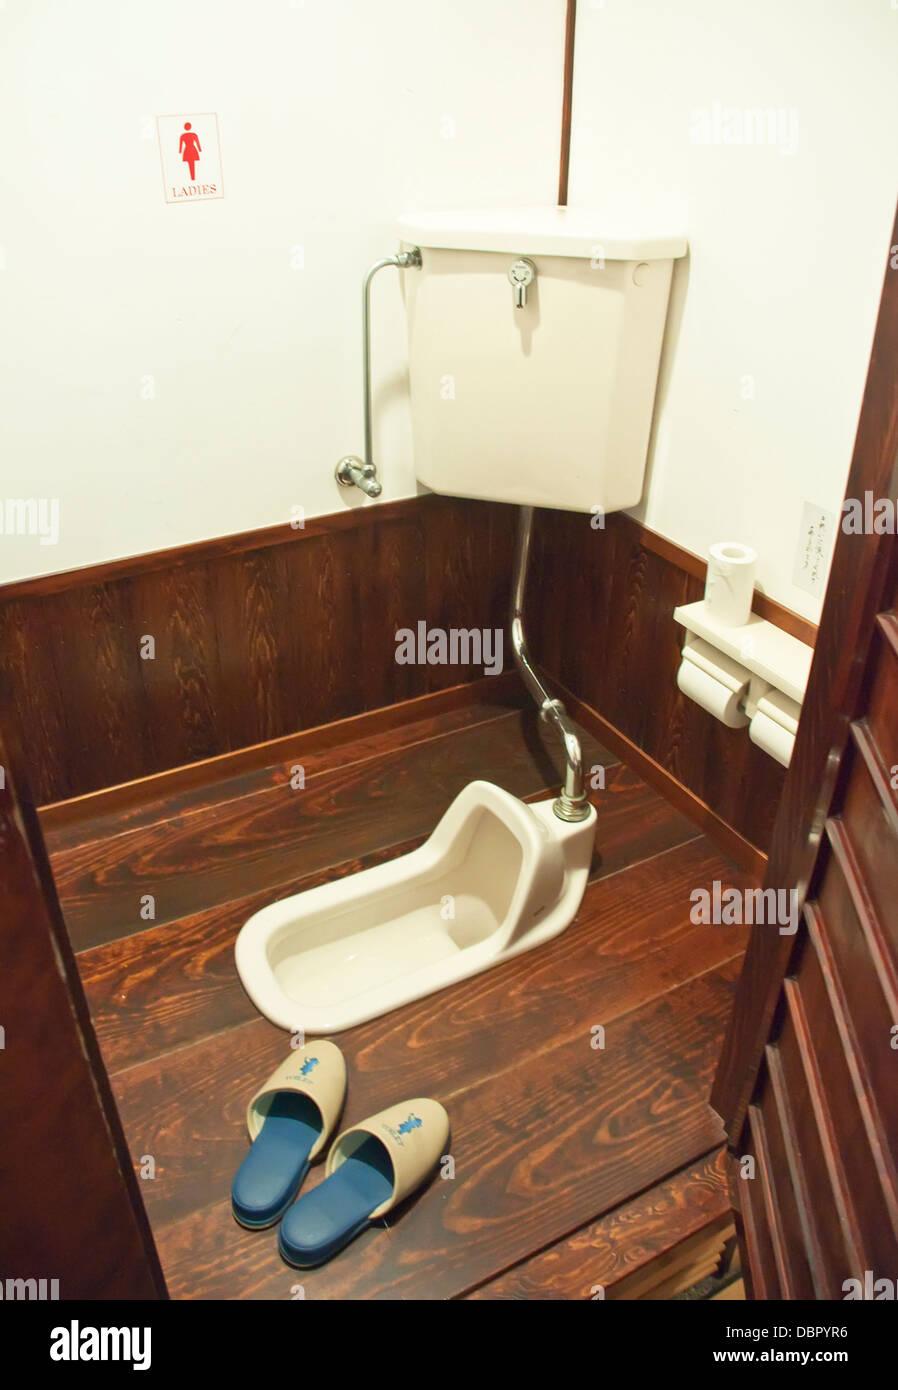 japanese toilet stockfotos japanese toilet bilder alamy. Black Bedroom Furniture Sets. Home Design Ideas